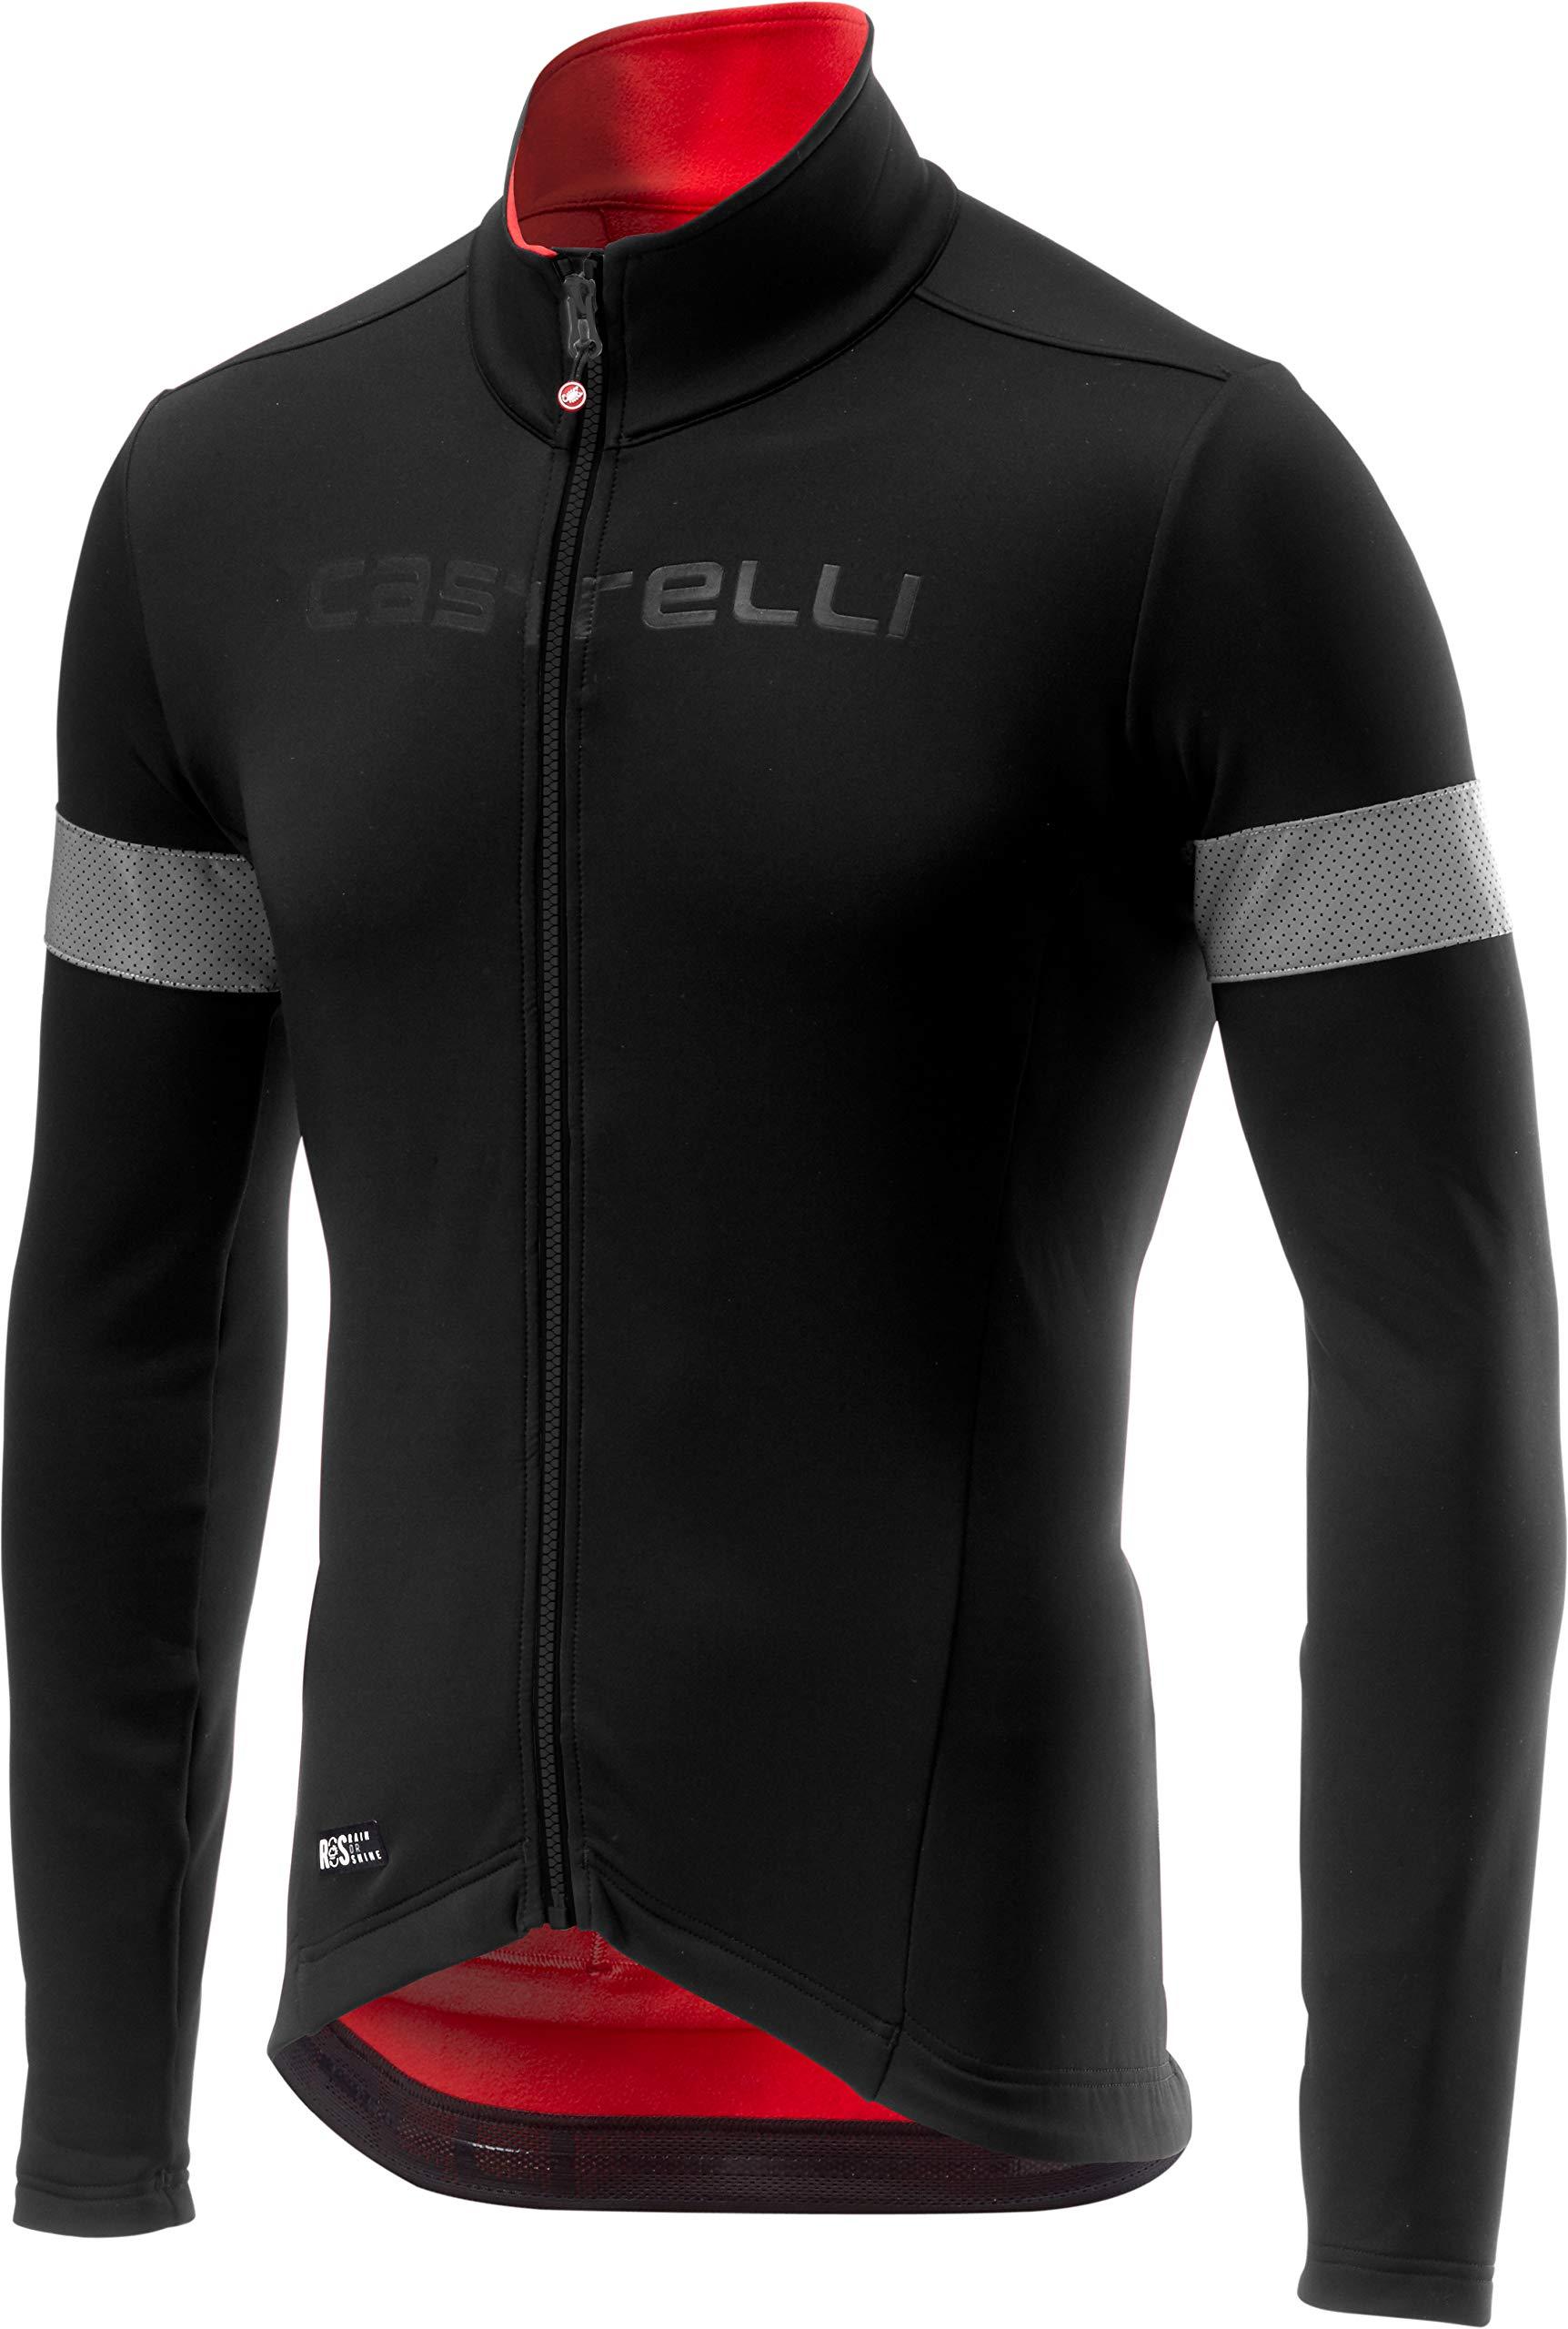 Castelli Nelmezzo ROS Jersey - Men's Black/Red, S